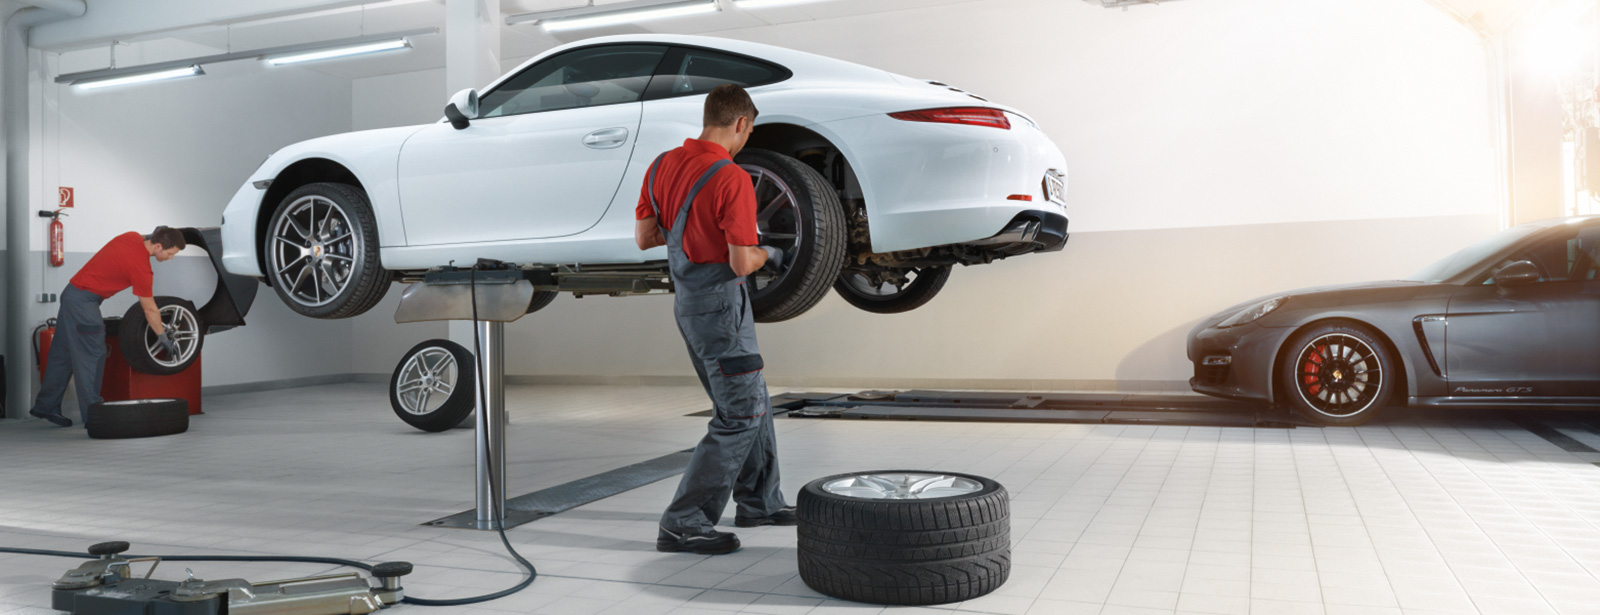 Reifen-/Rädermontage